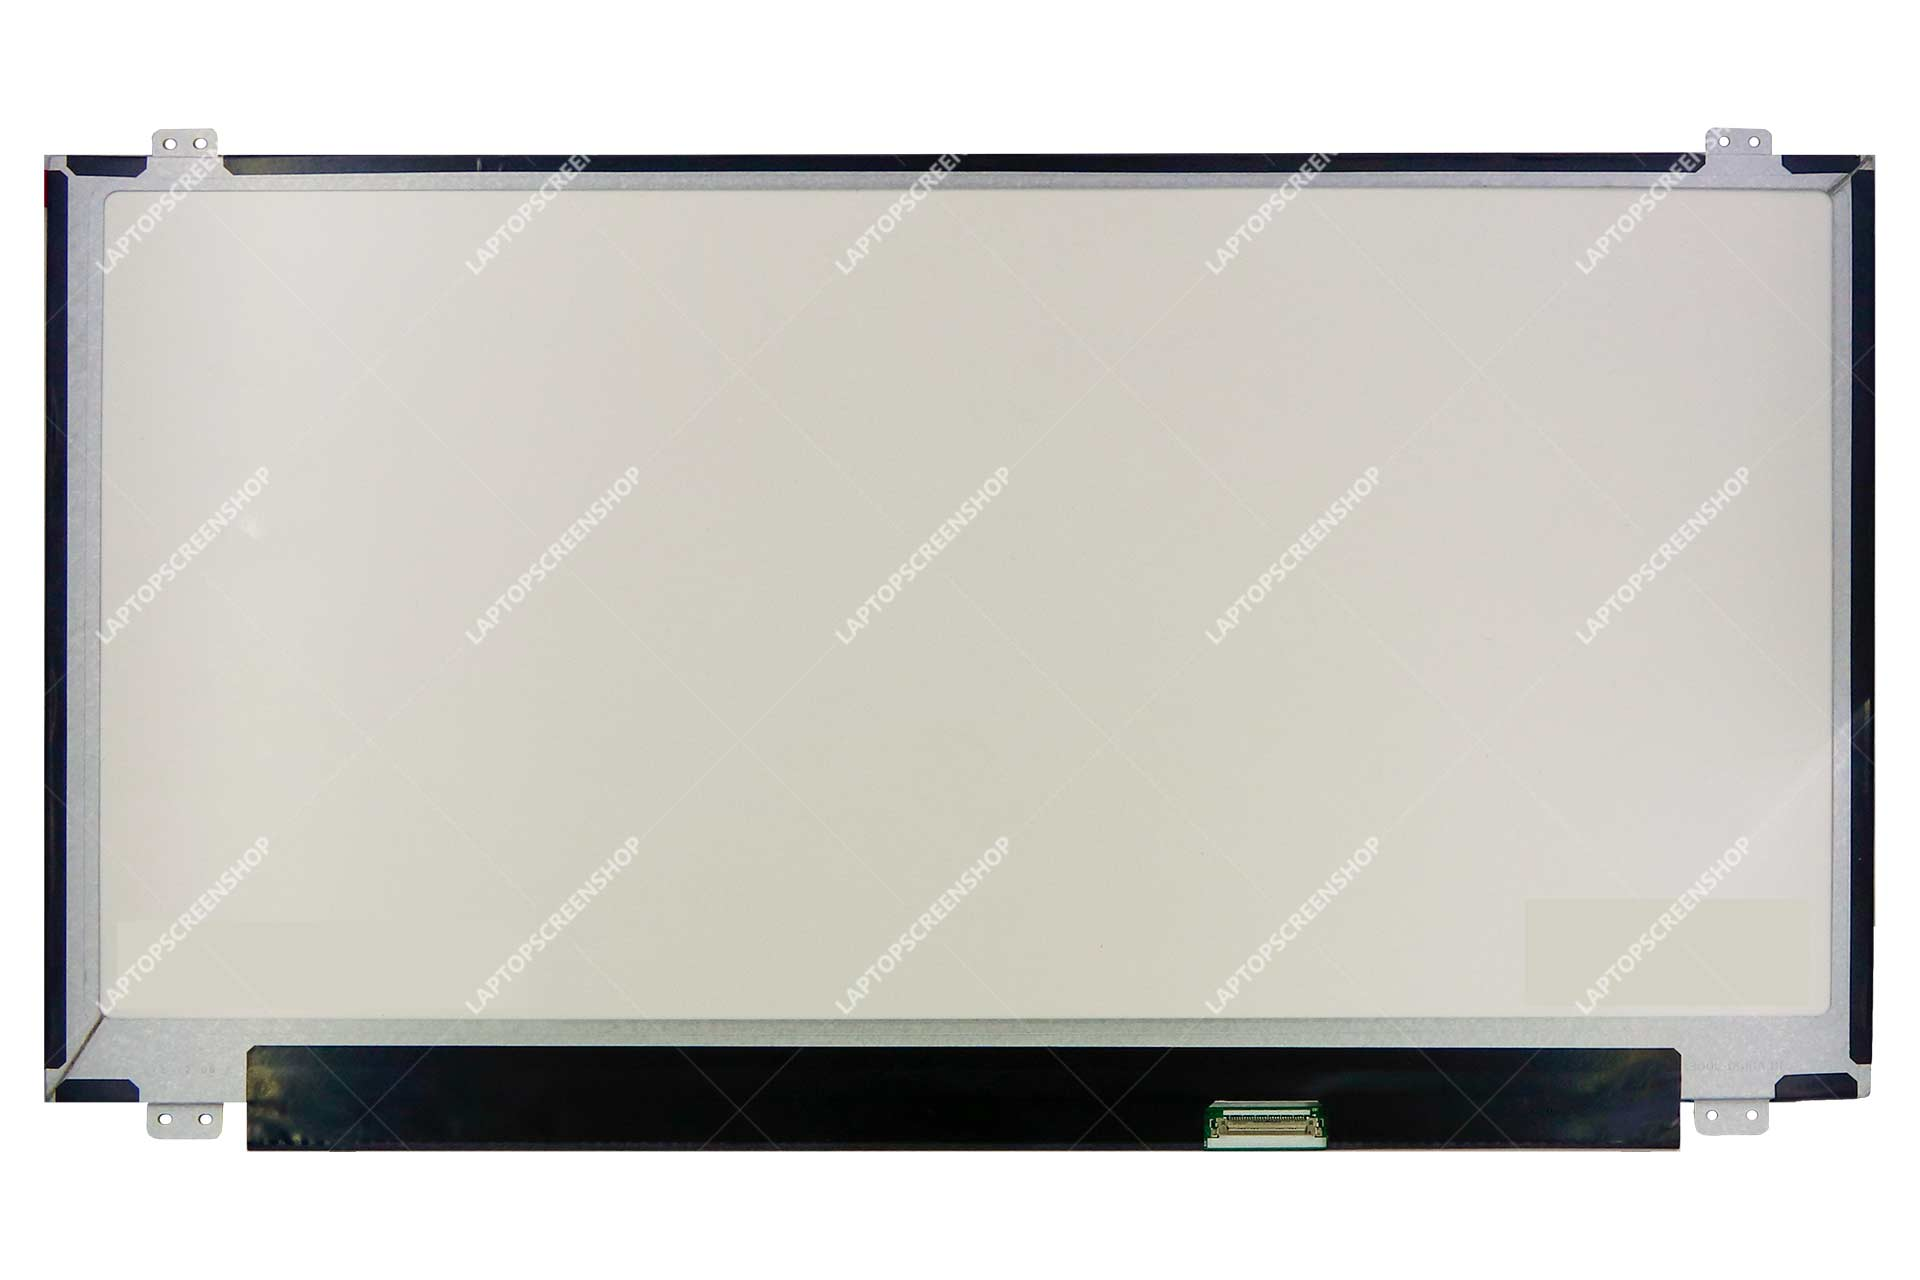 ACER-ASPIRE-E1-432-SERIES-LCD-LCD |HD|فروشگاه لپ تاپ اسکرين | تعمير لپ تاپ